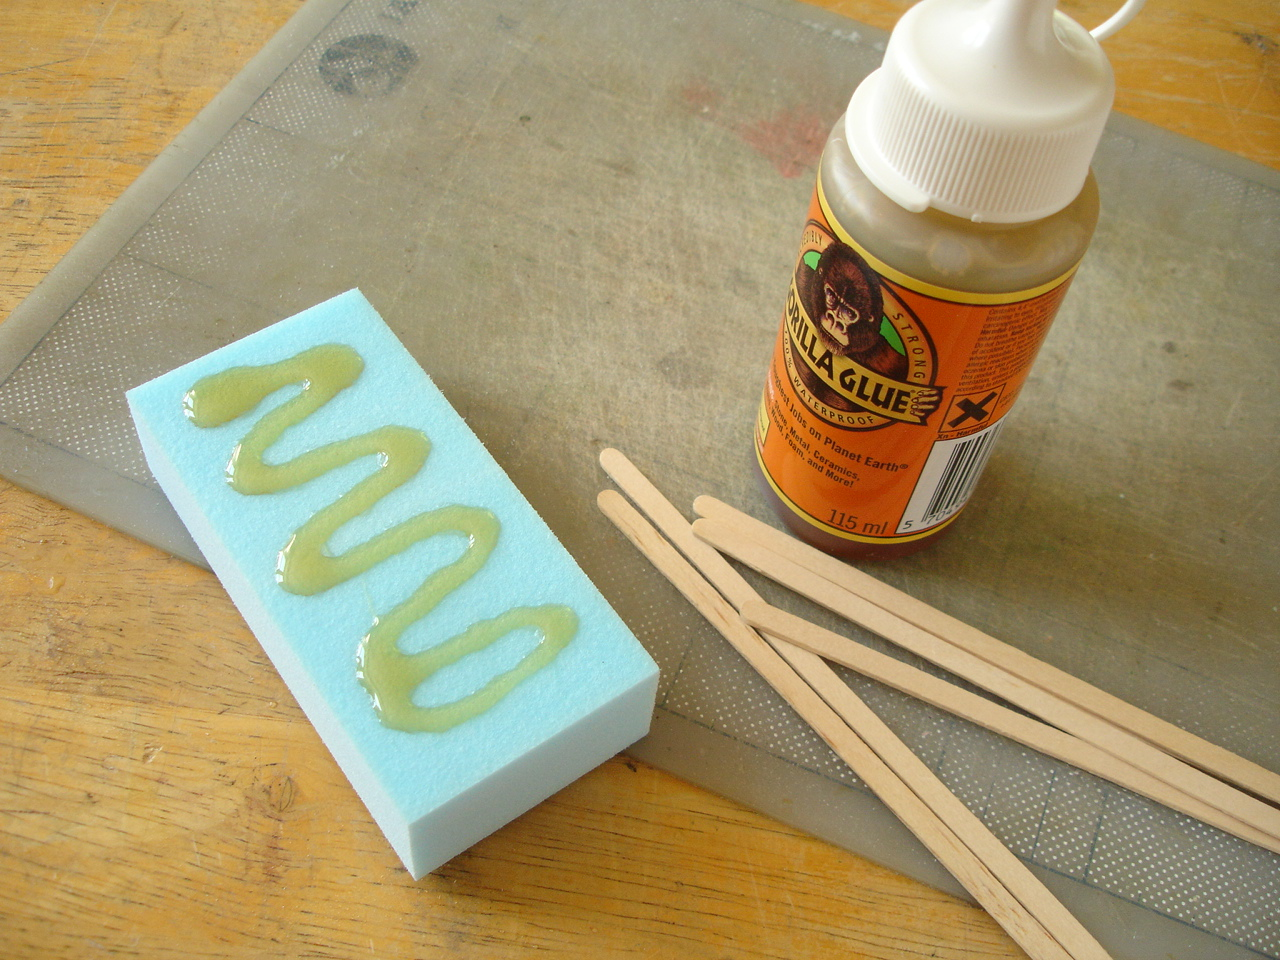 How To Use Gorilla Glue Properly Davidneat